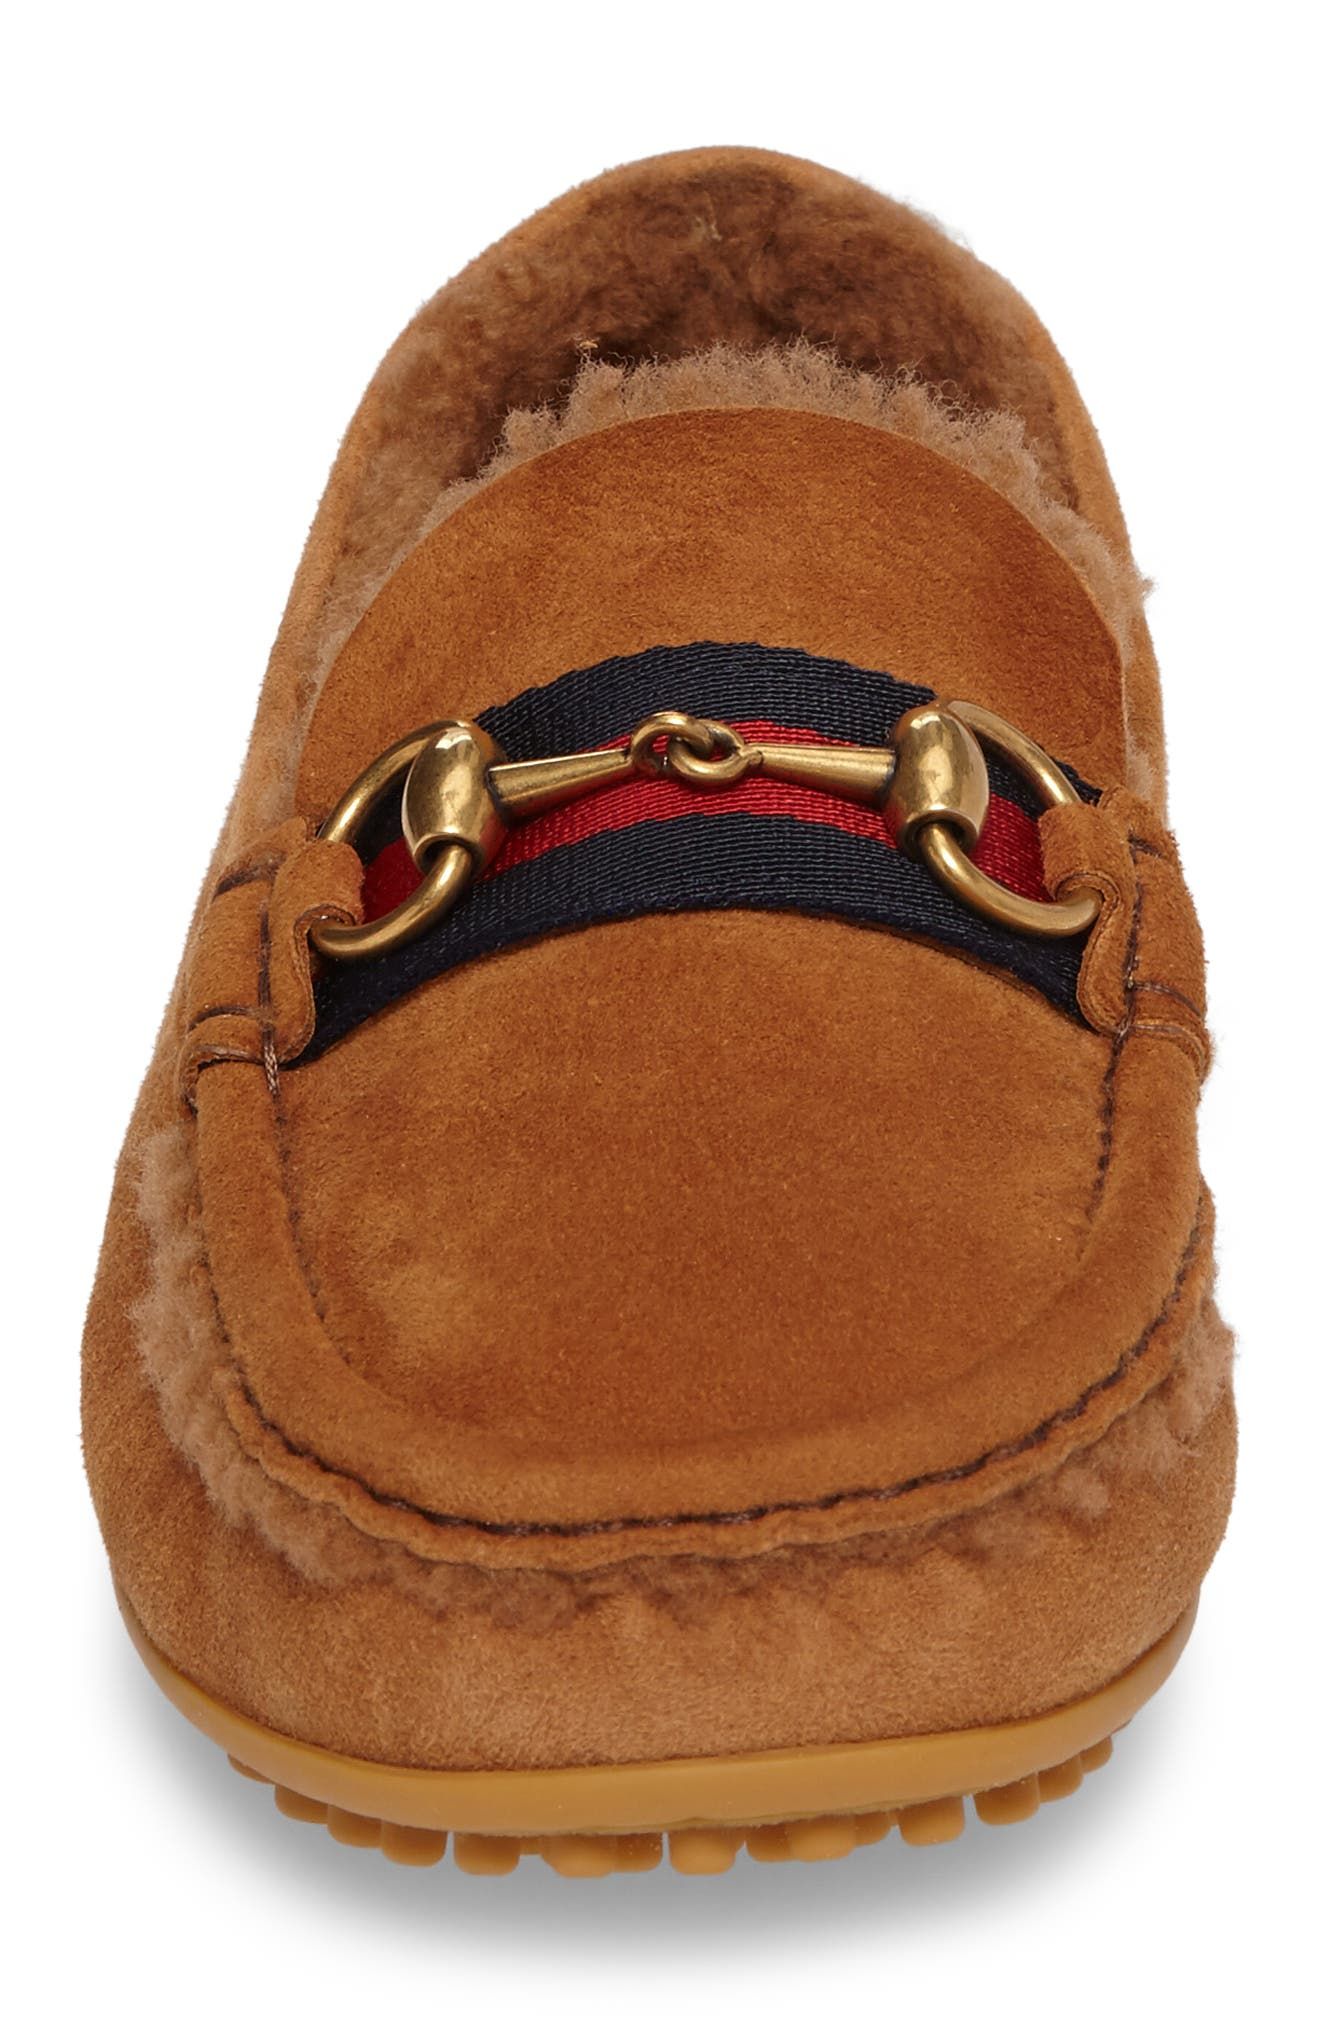 Driving Shoe with Genuine Shearling,                             Alternate thumbnail 4, color,                             Dark Tan